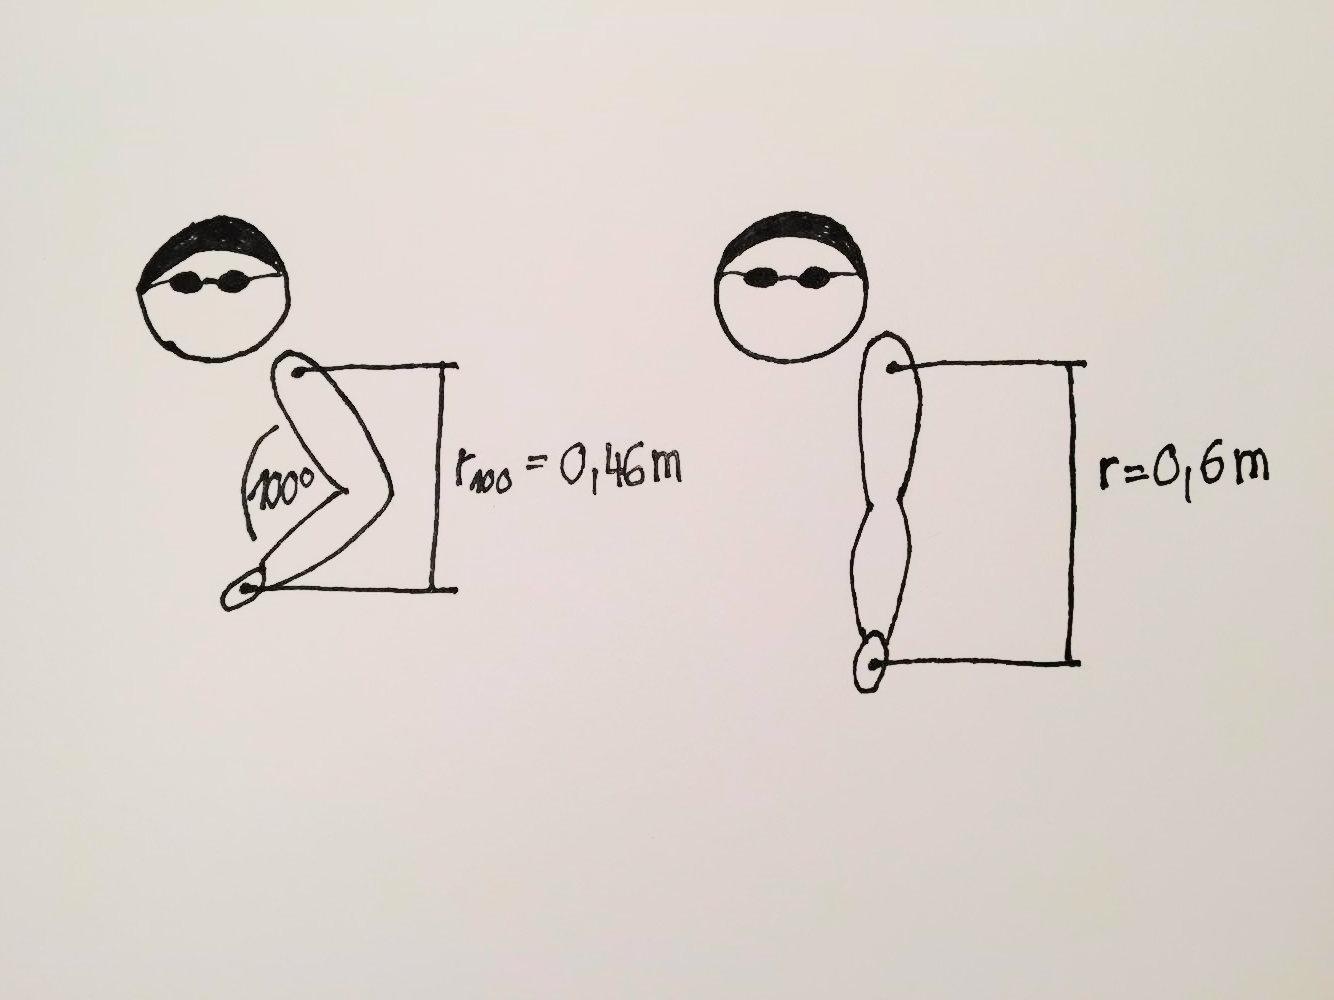 Schwimmen, Schulterschmerzen, Berechnung